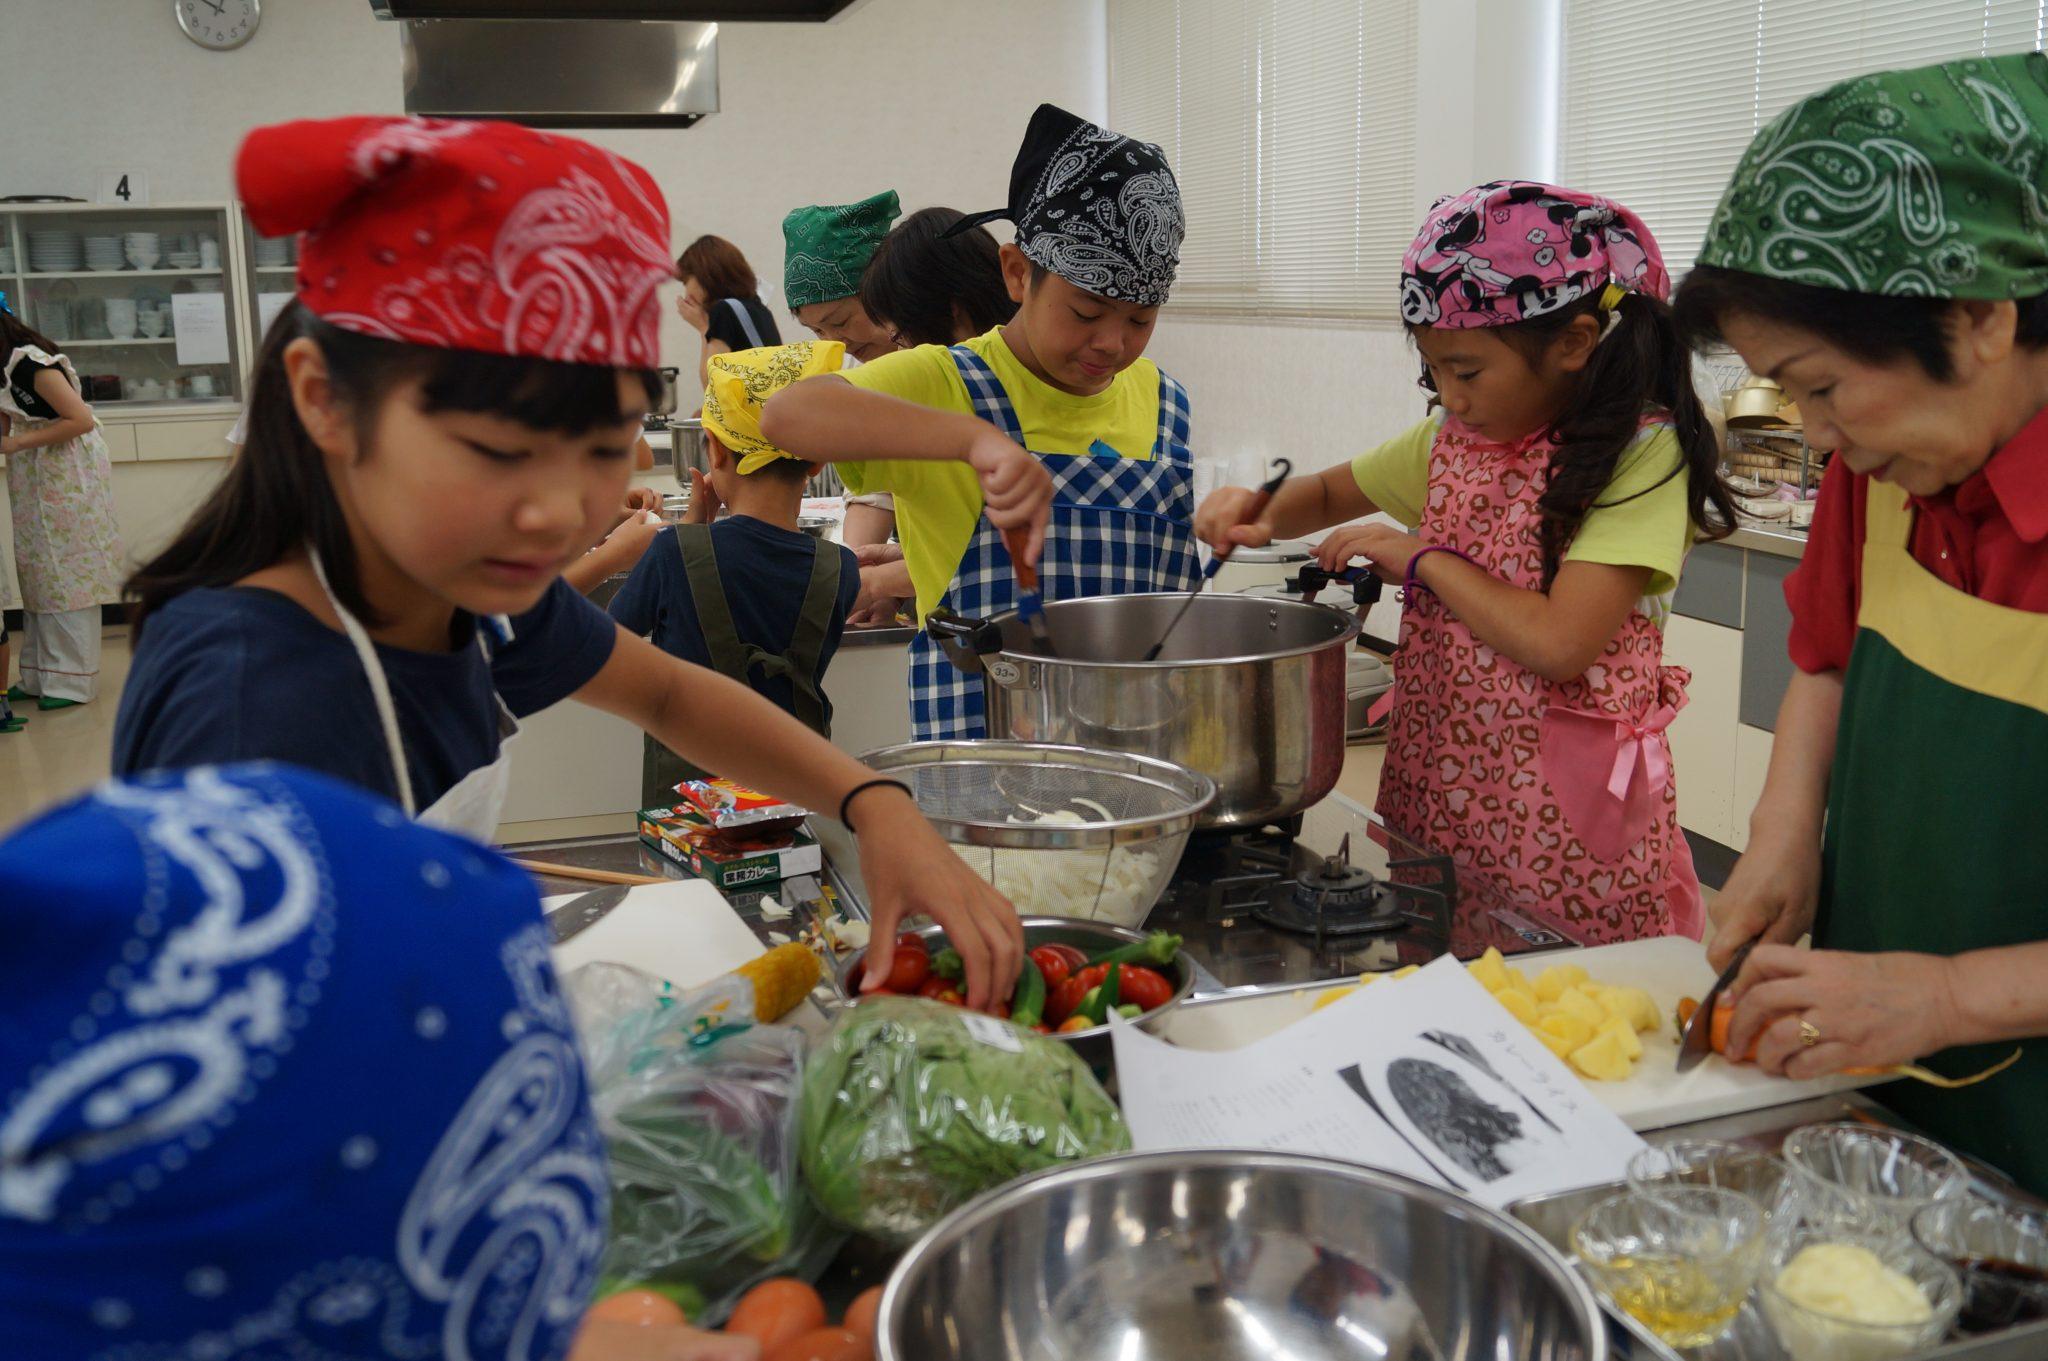 JA 海部東農業協同組合(あまひがし) -子ども達が農産物販売 売上金の一部を九州復興活動へ寄付